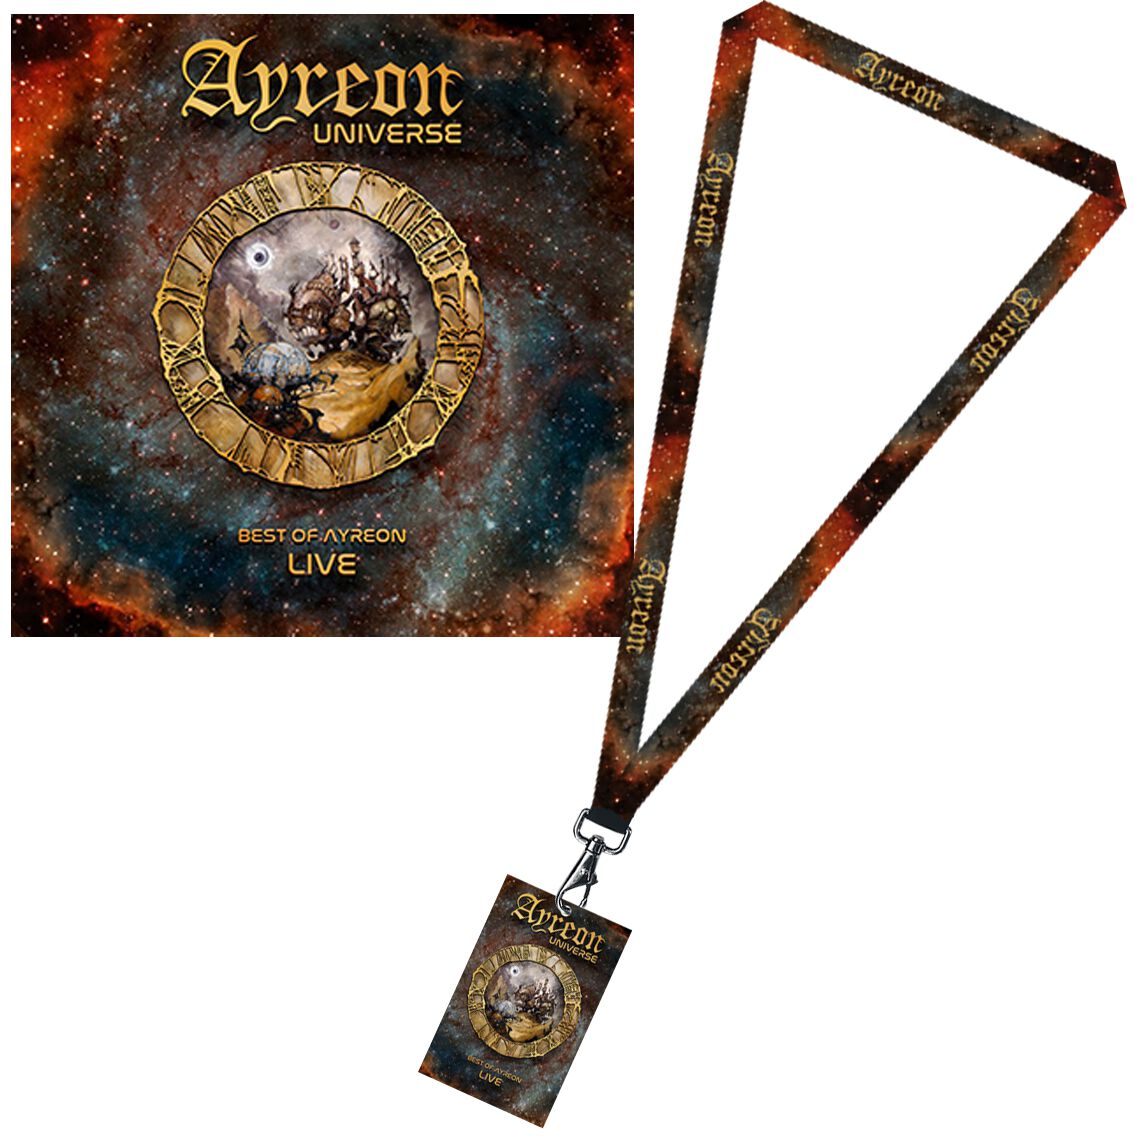 Image of   Ayreon Ayreon universe - Best of Ayreon live 2-CD & Nøglestrop standard